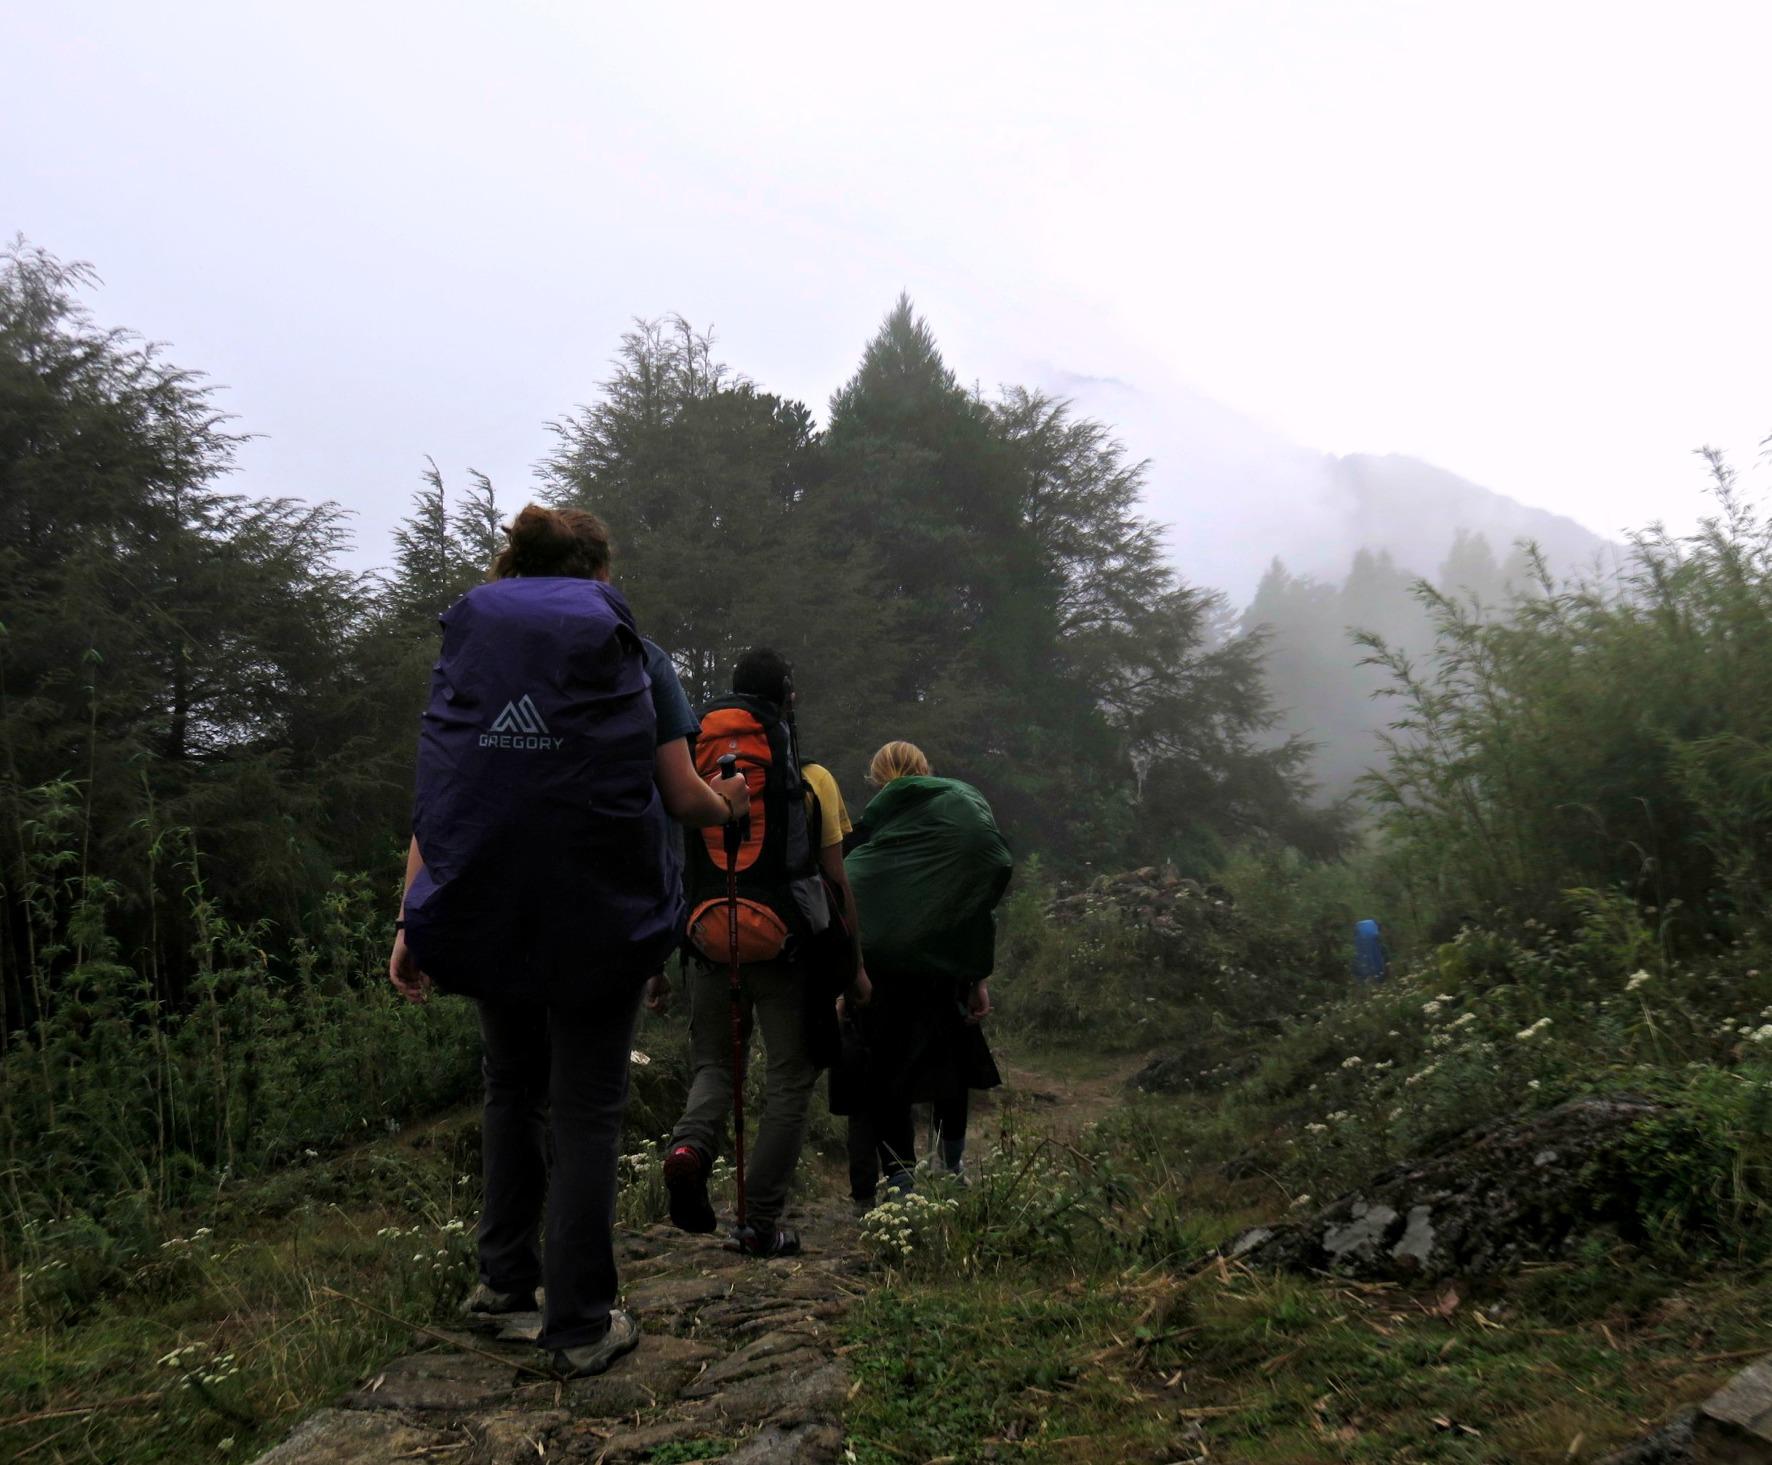 Trekking through the Himalayan Mountains in India.